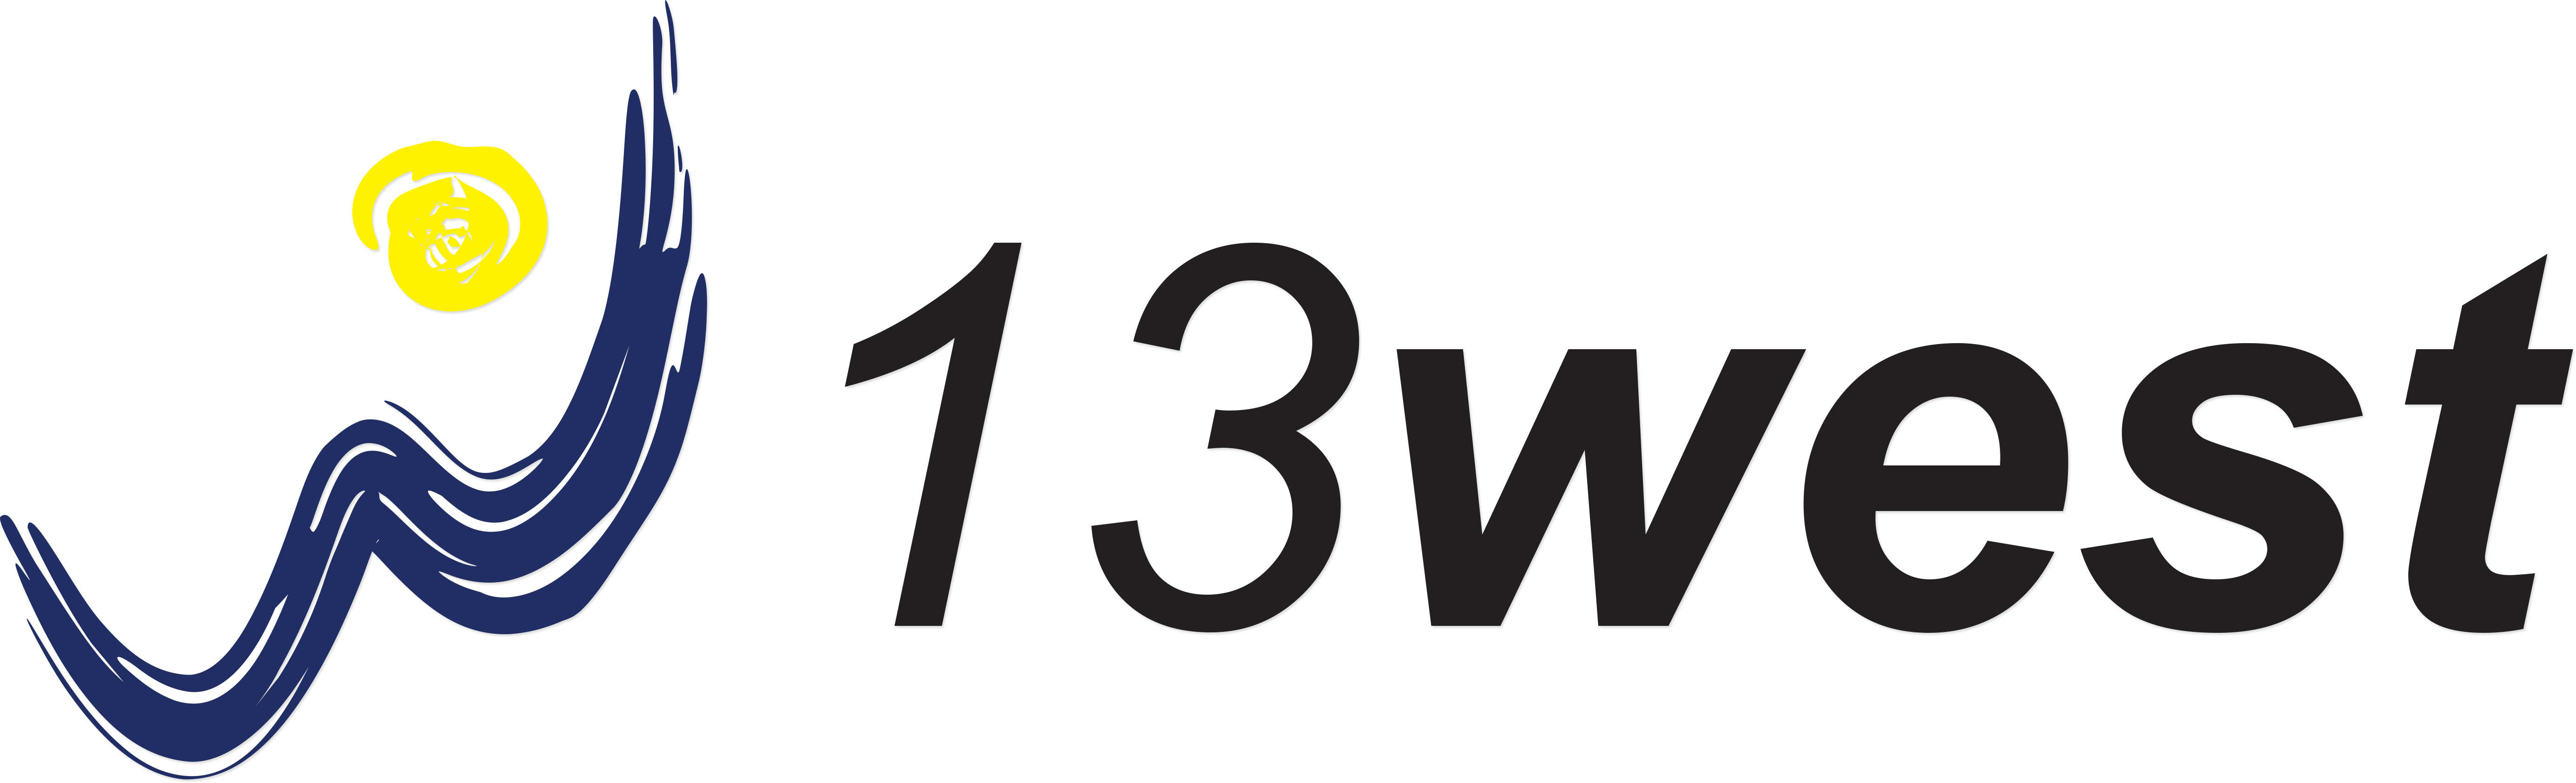 13west